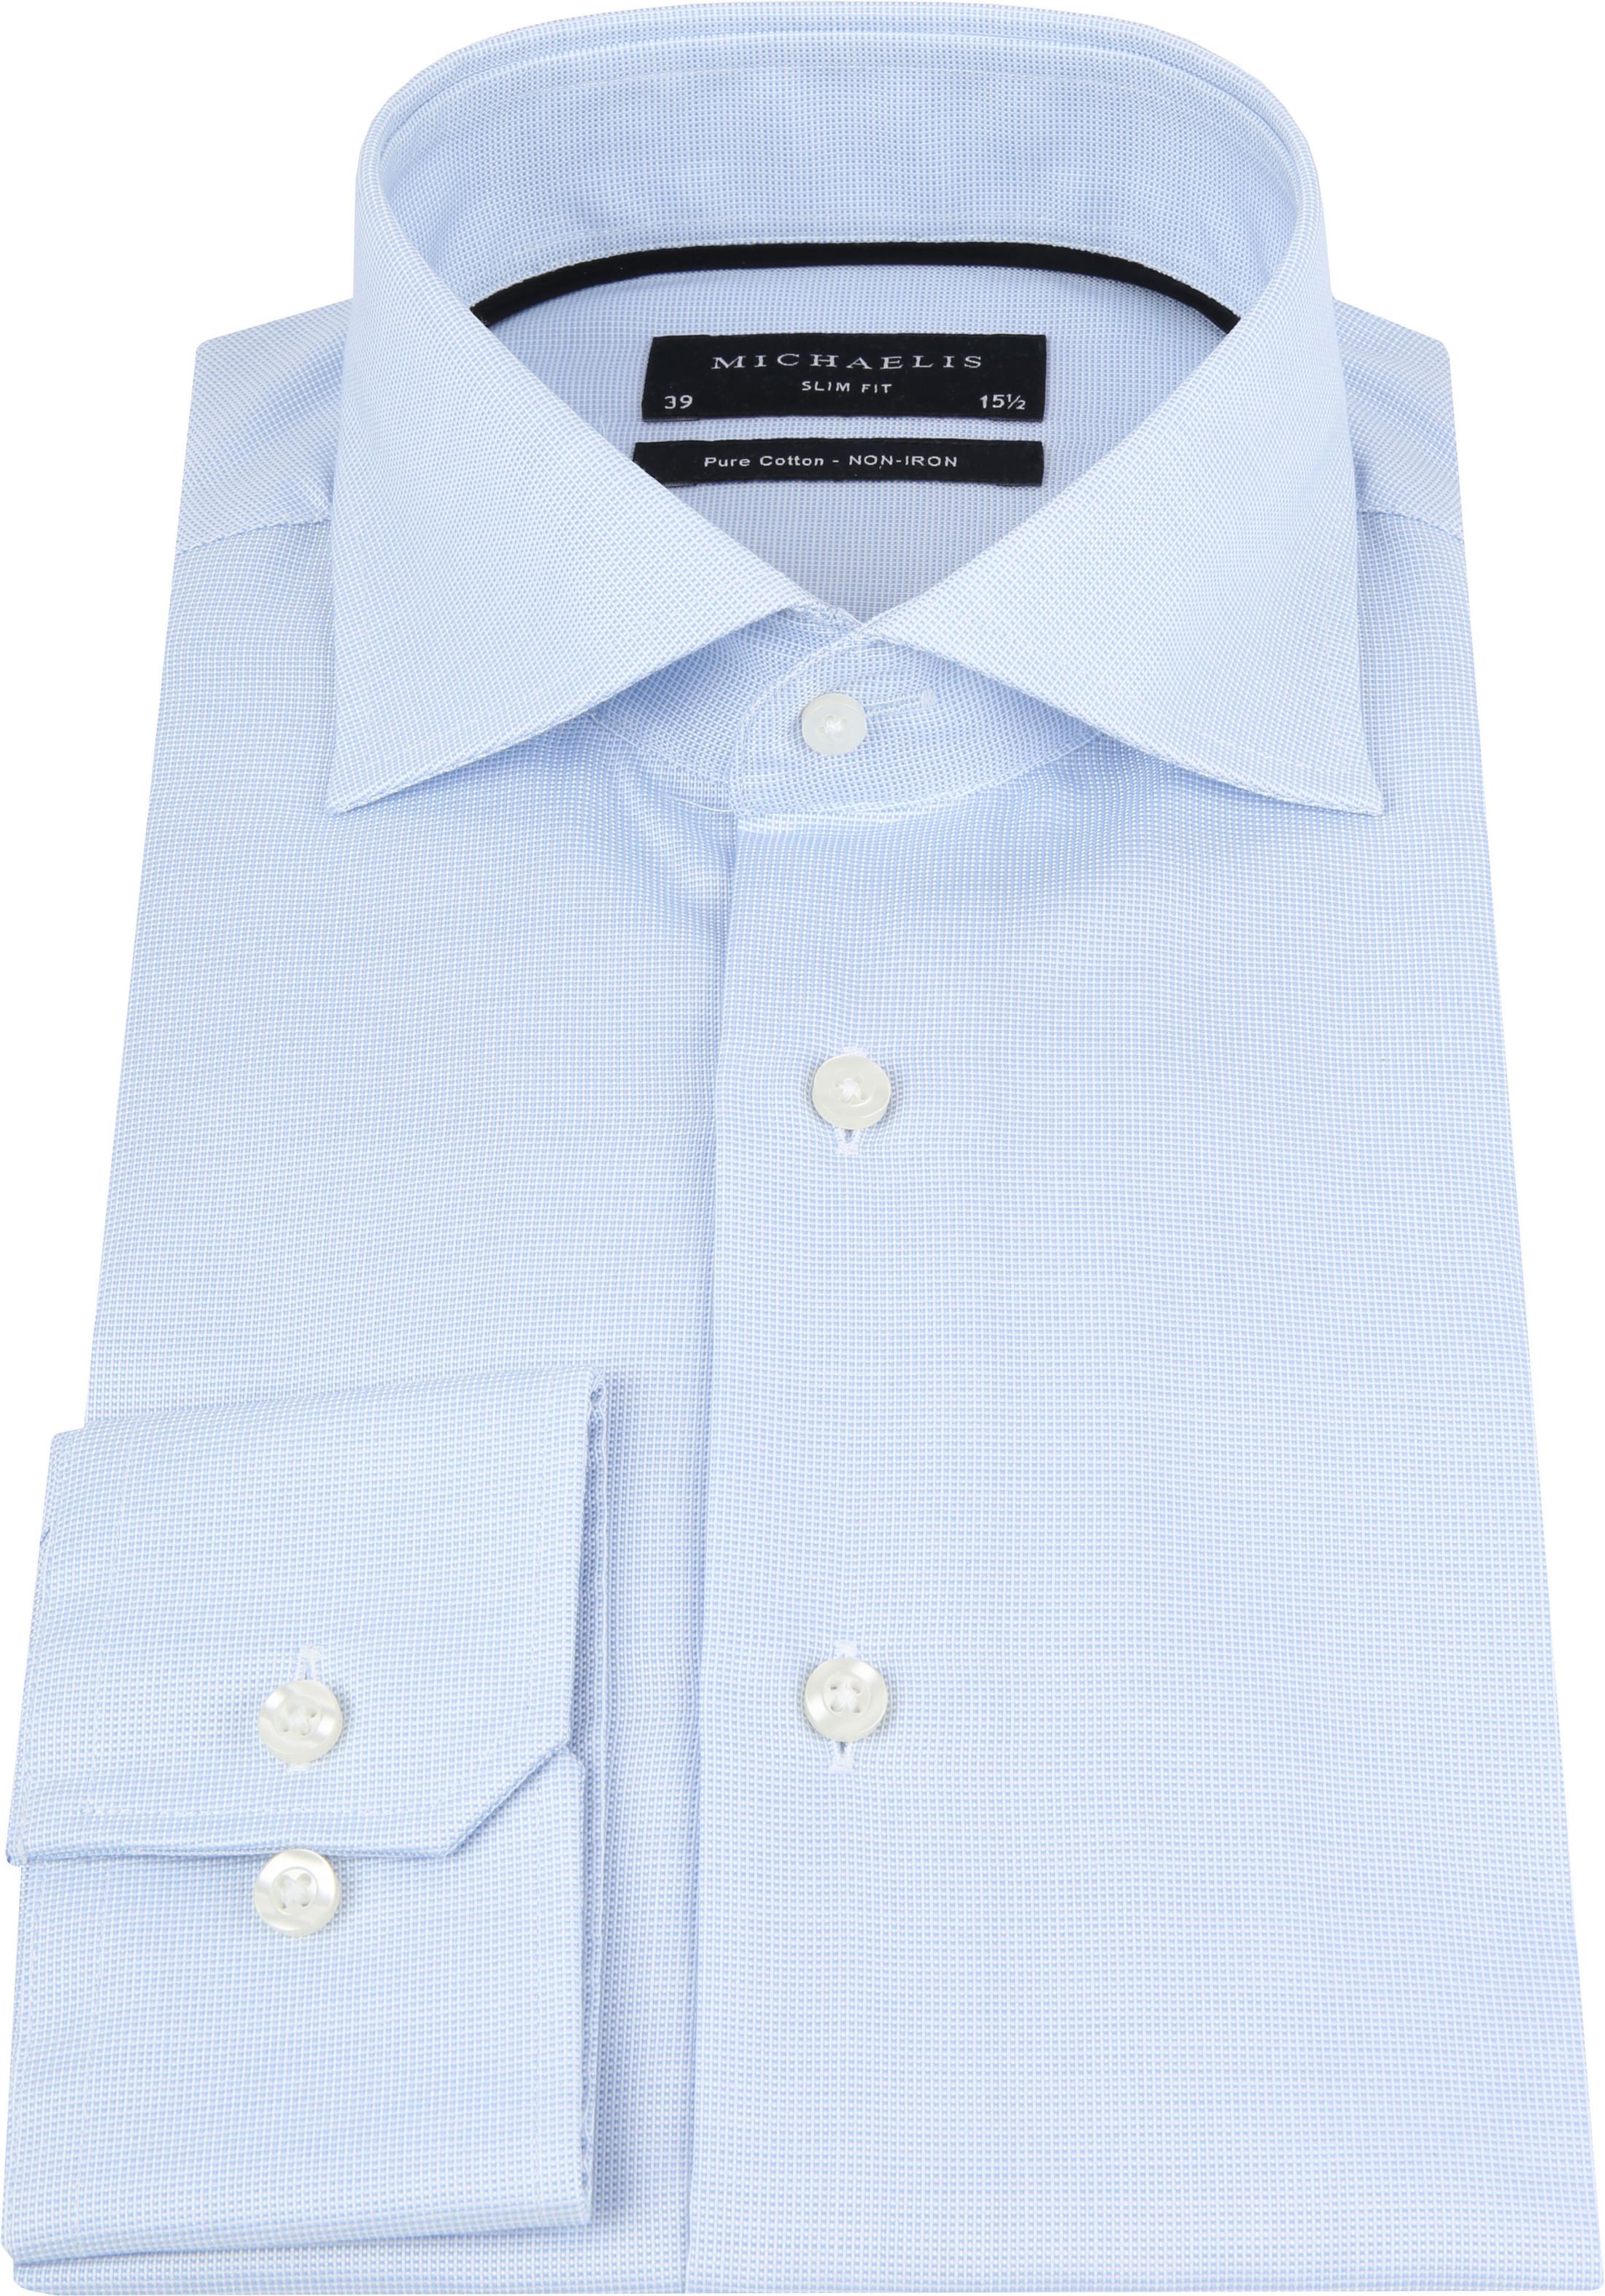 Michaelis Overhemd SlimFit Blue Dessin foto 3